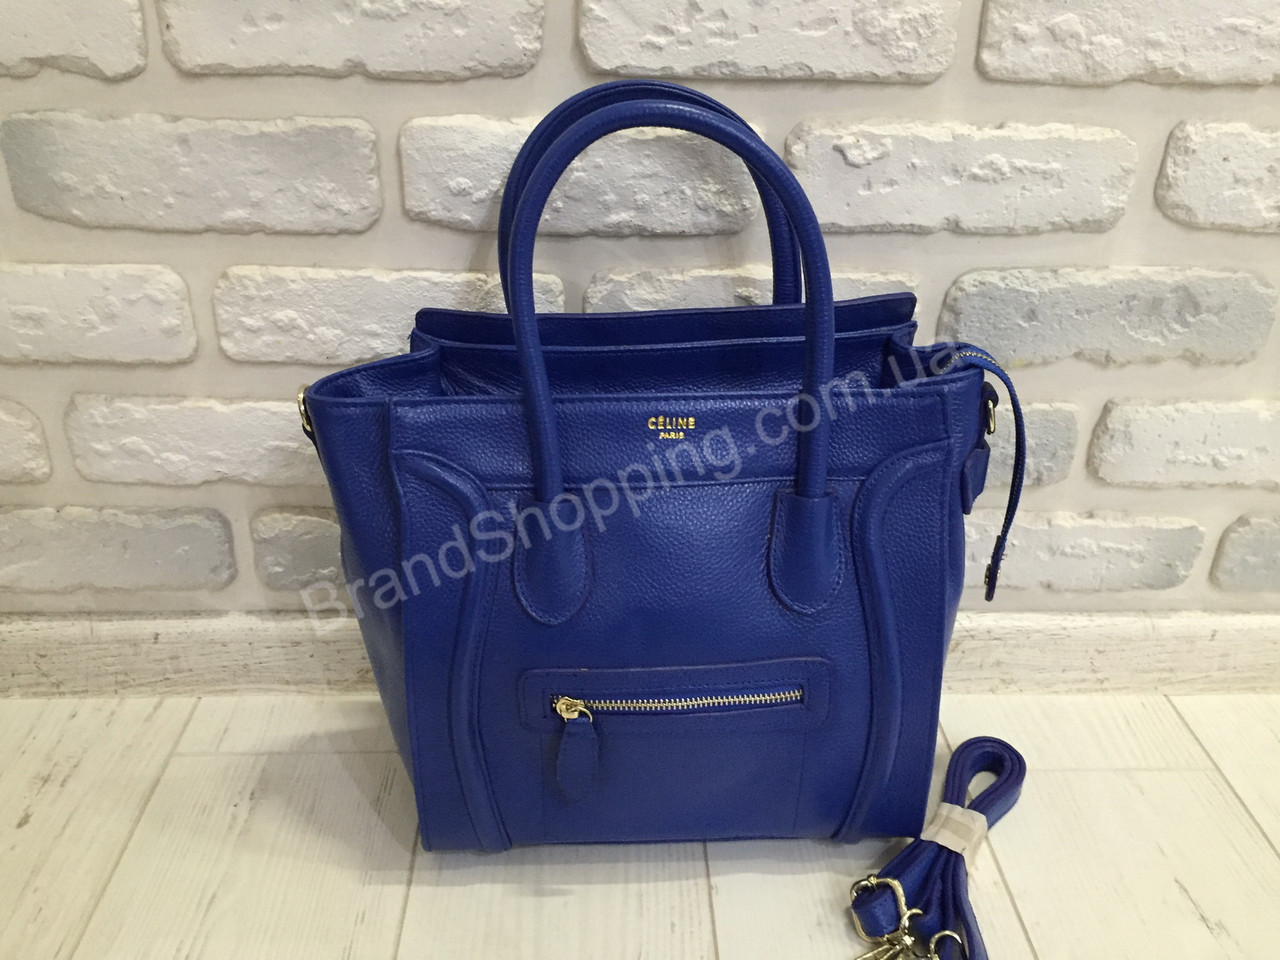 сумка Celine купить в москве : Celine